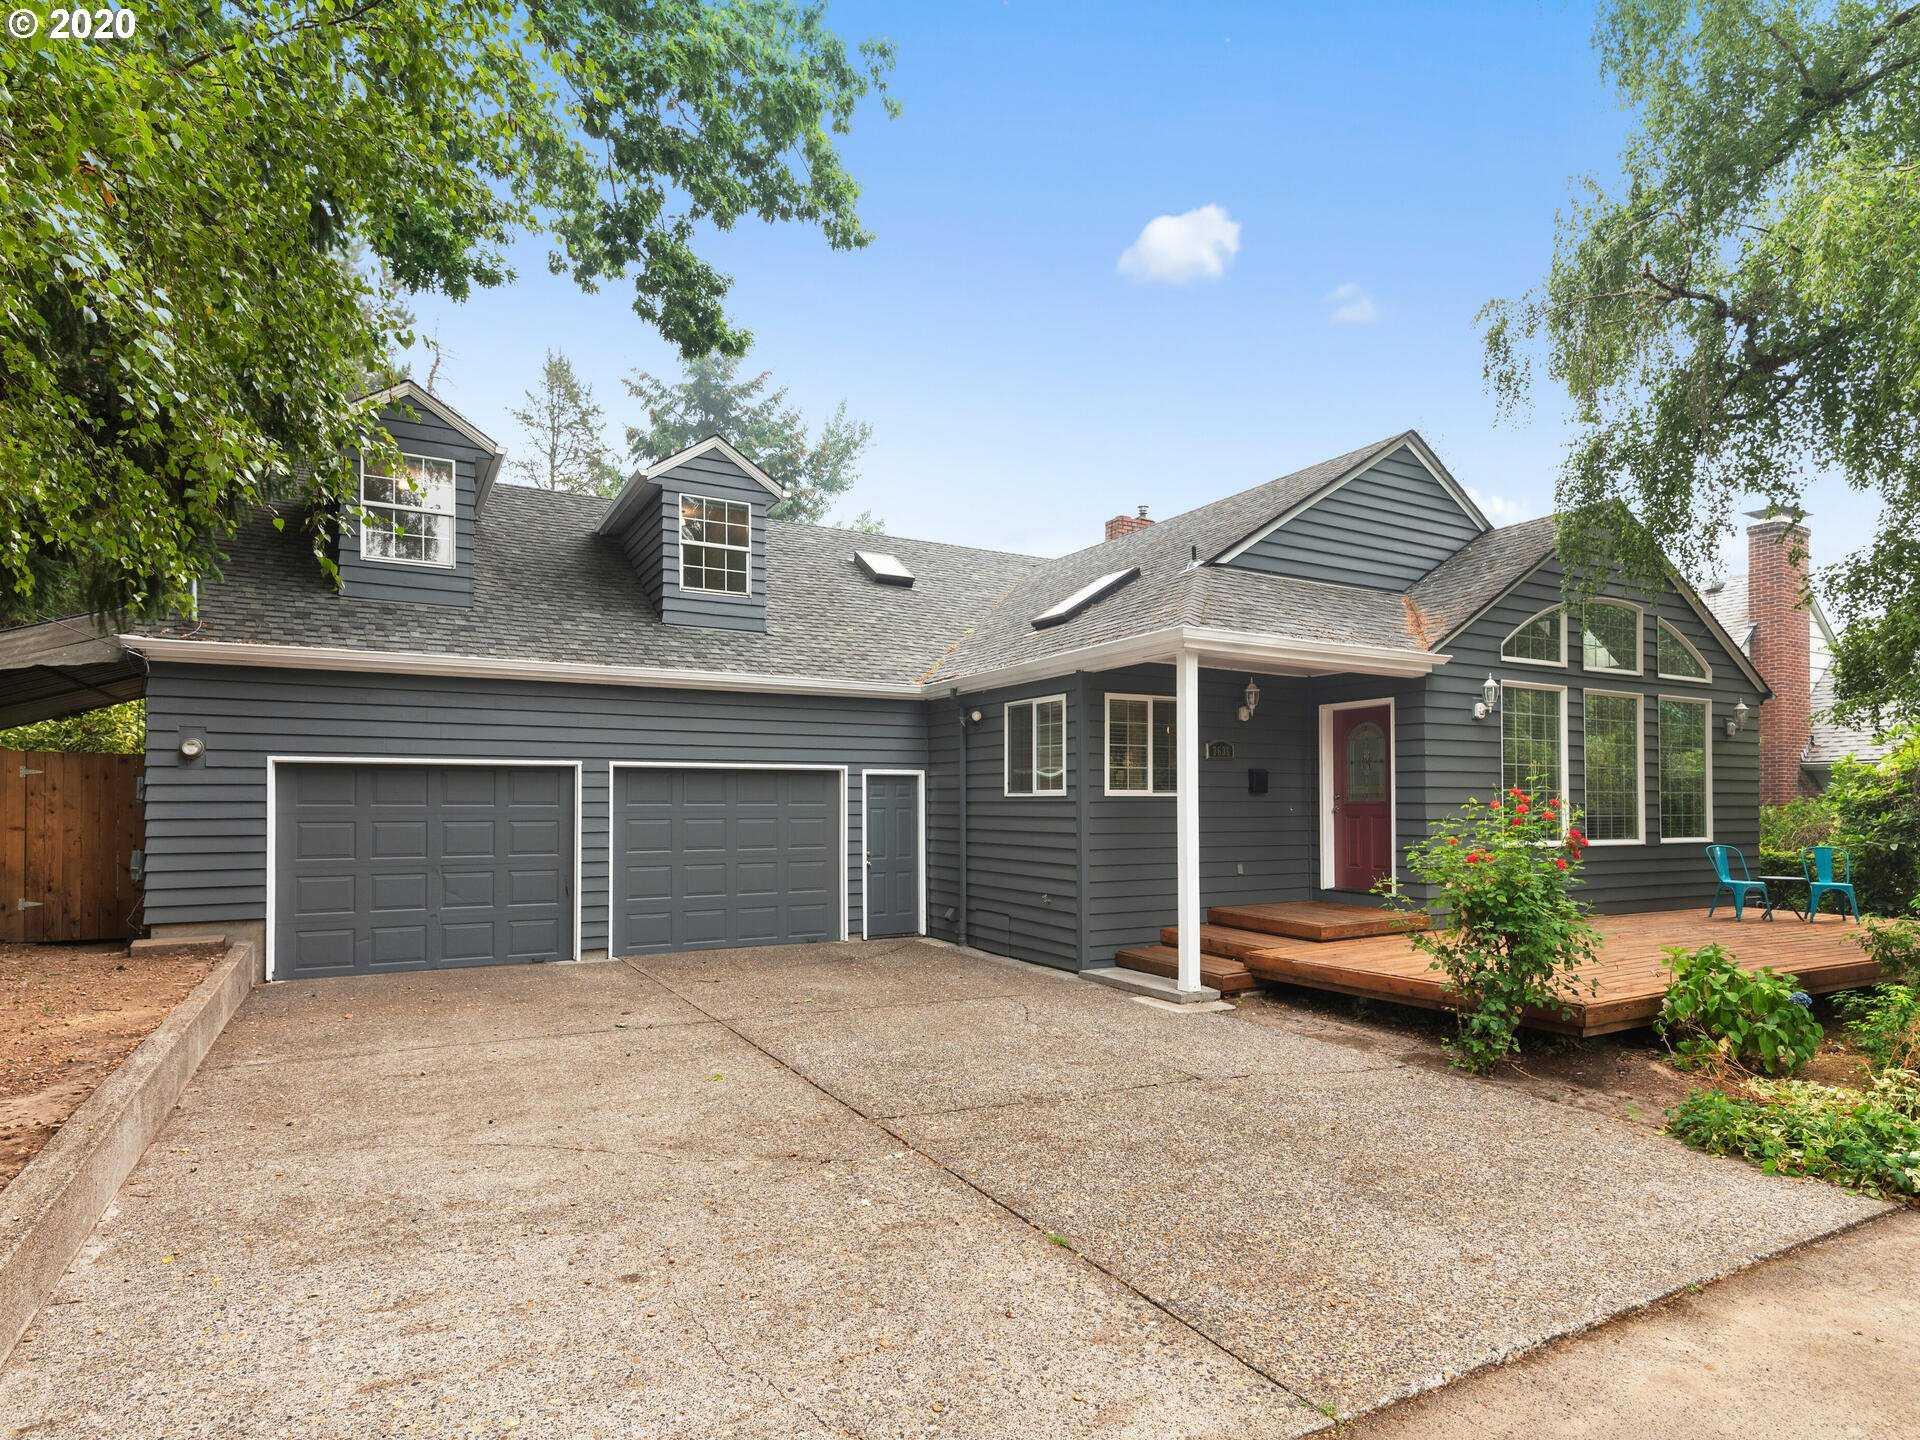 $619,000 - 5Br/2Ba - for Sale in Hillsdale/multnomah Village, Portland